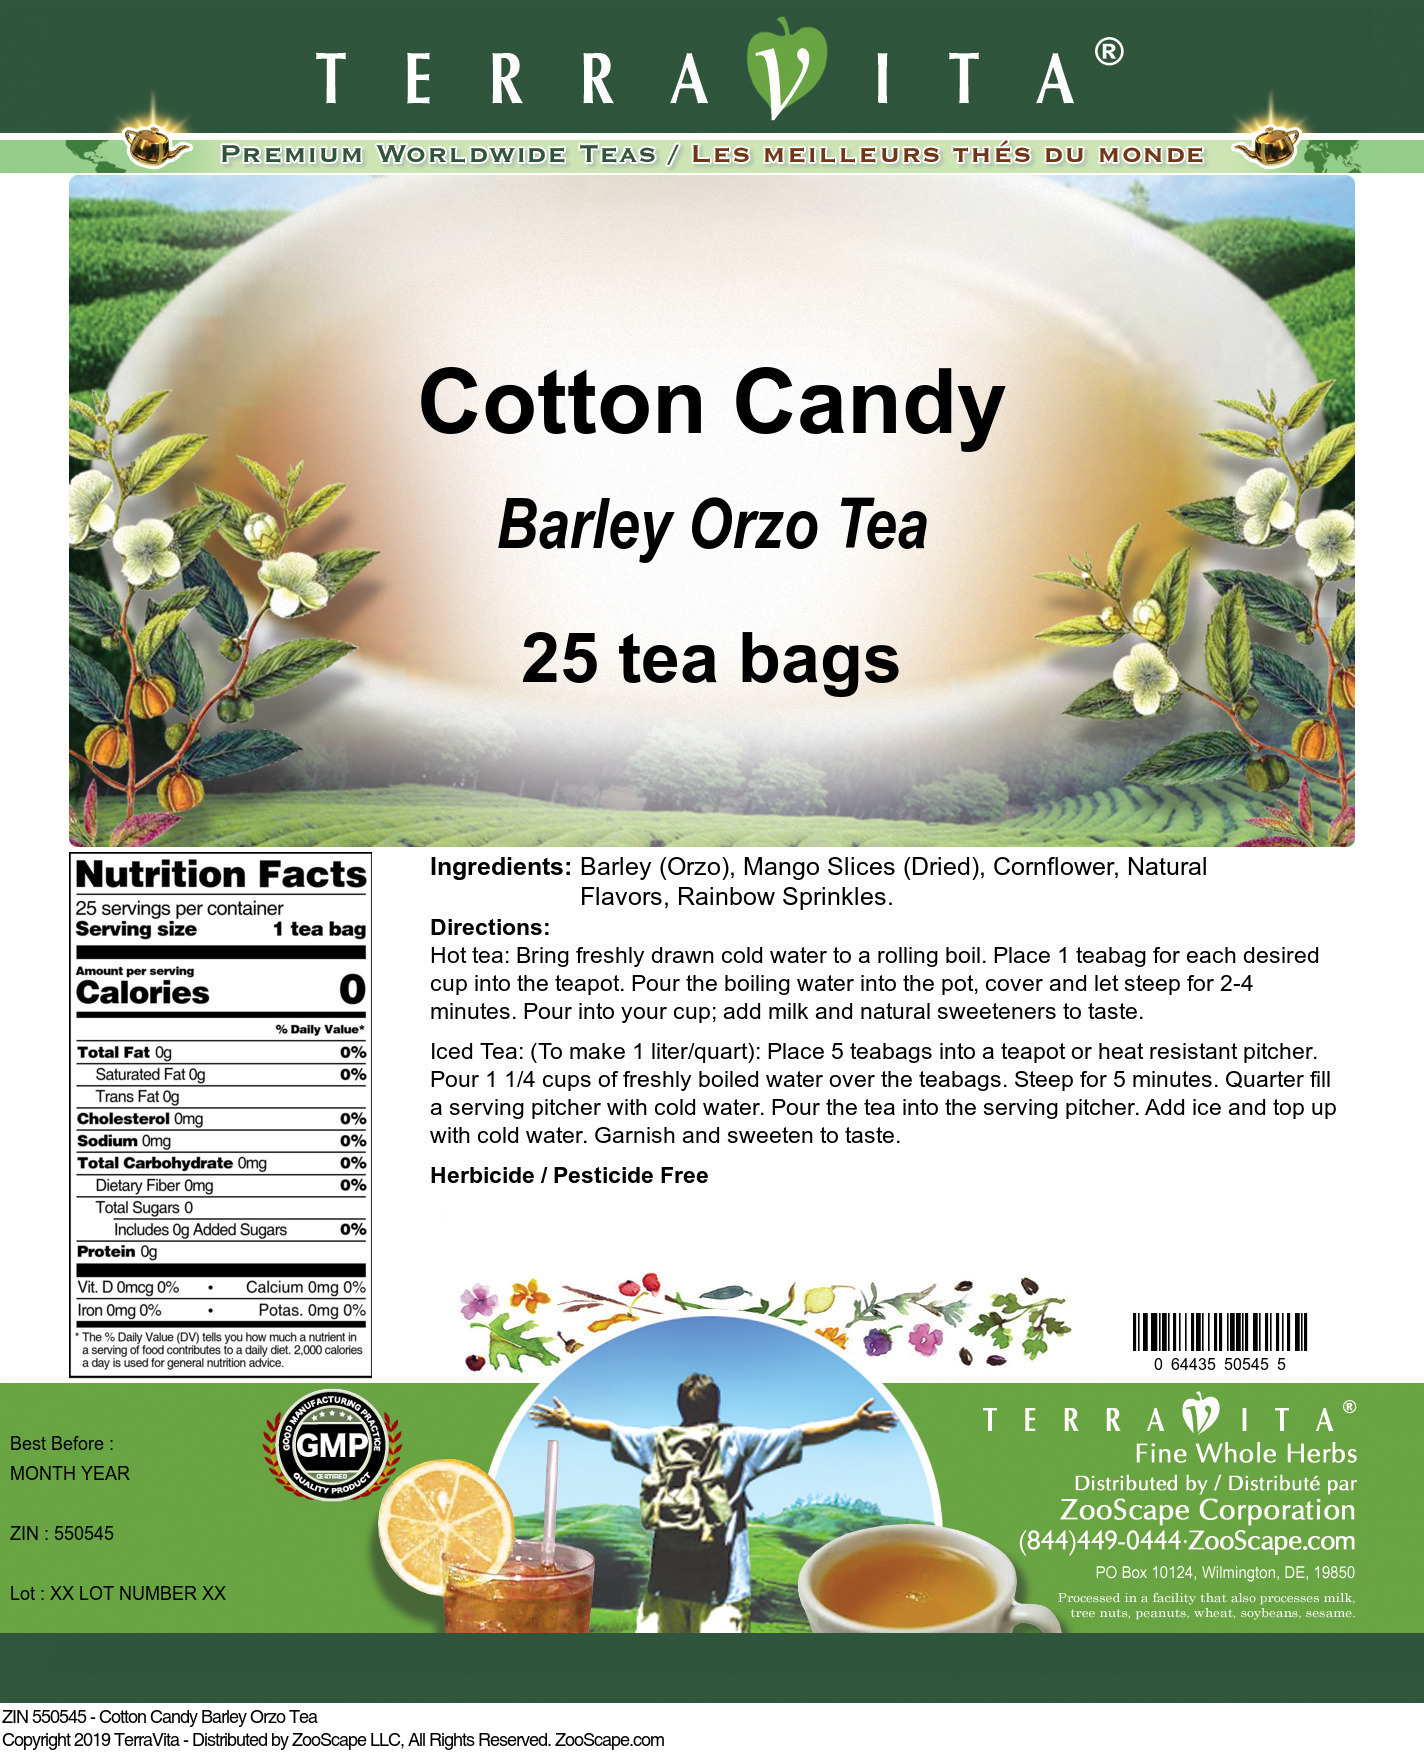 Cotton Candy Barley Orzo